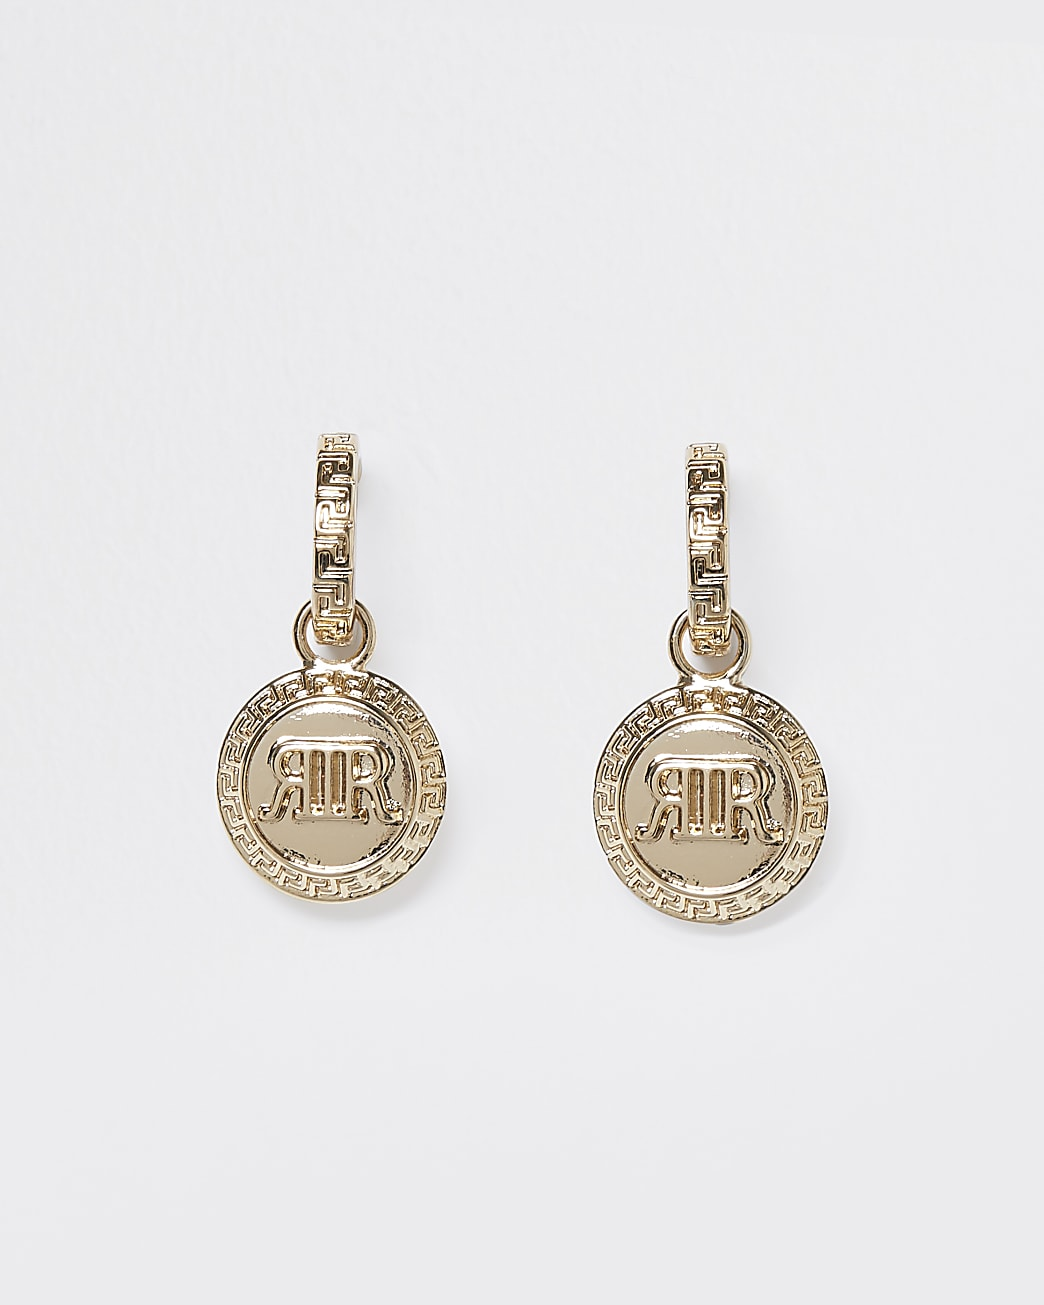 Gold 'RIR' coin drop earrings